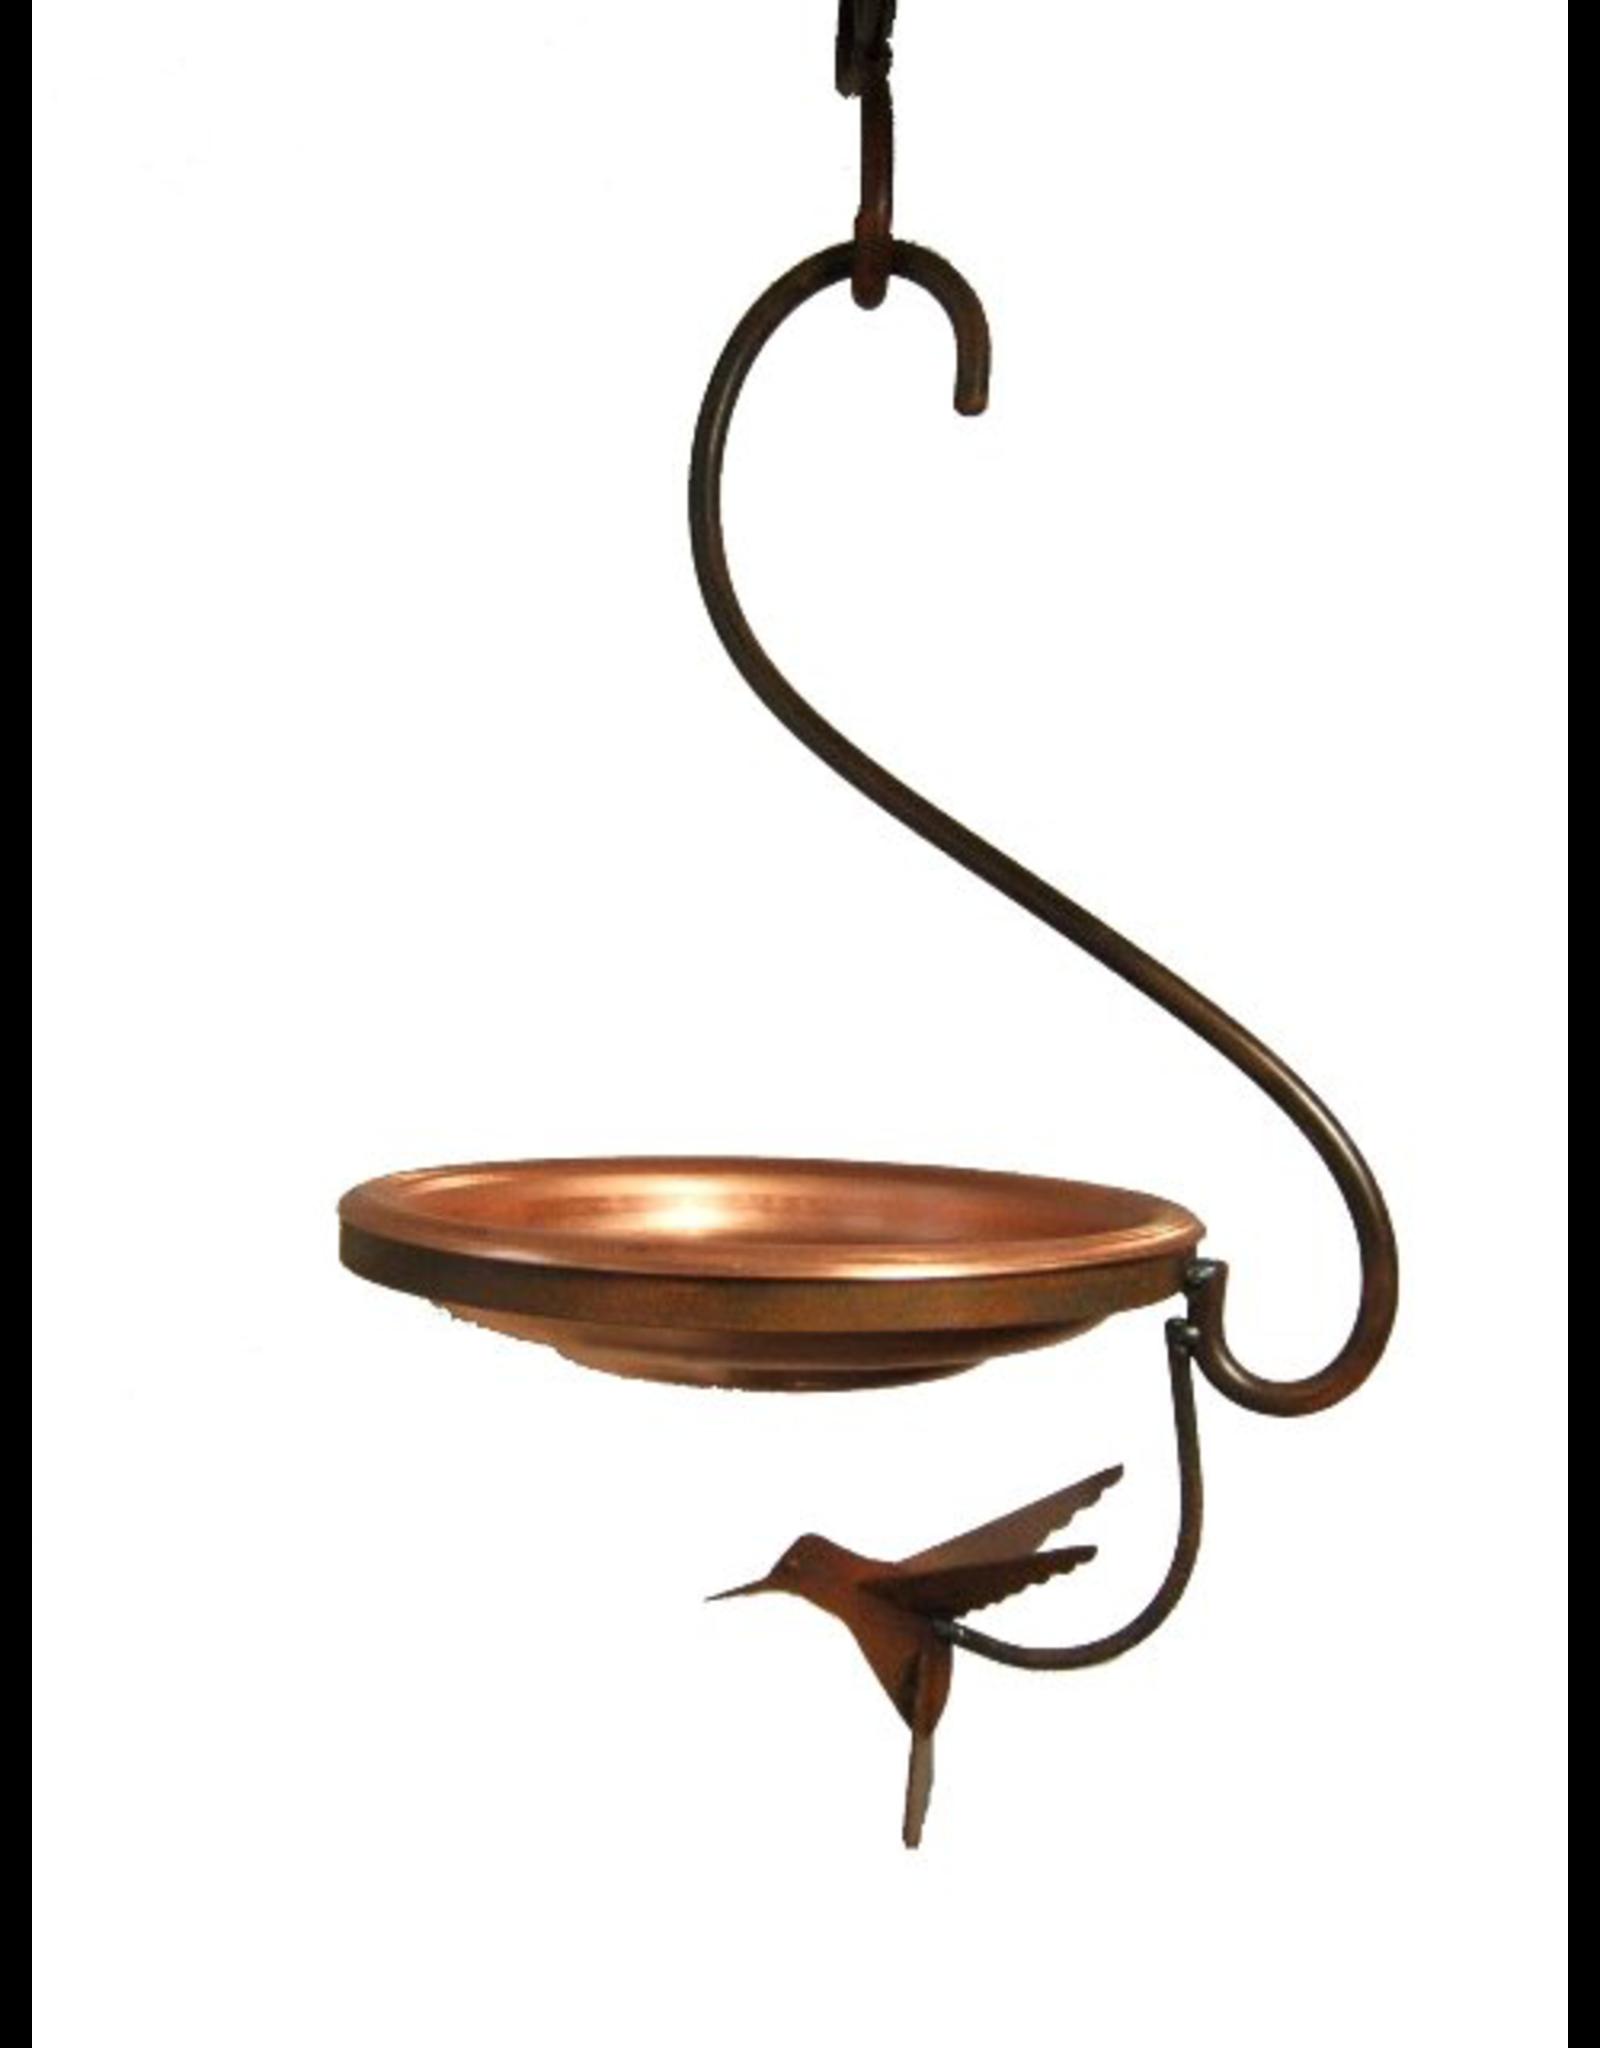 Martin House G.A. MH007 Hanging Brass Bird Bath. Made in Canada.